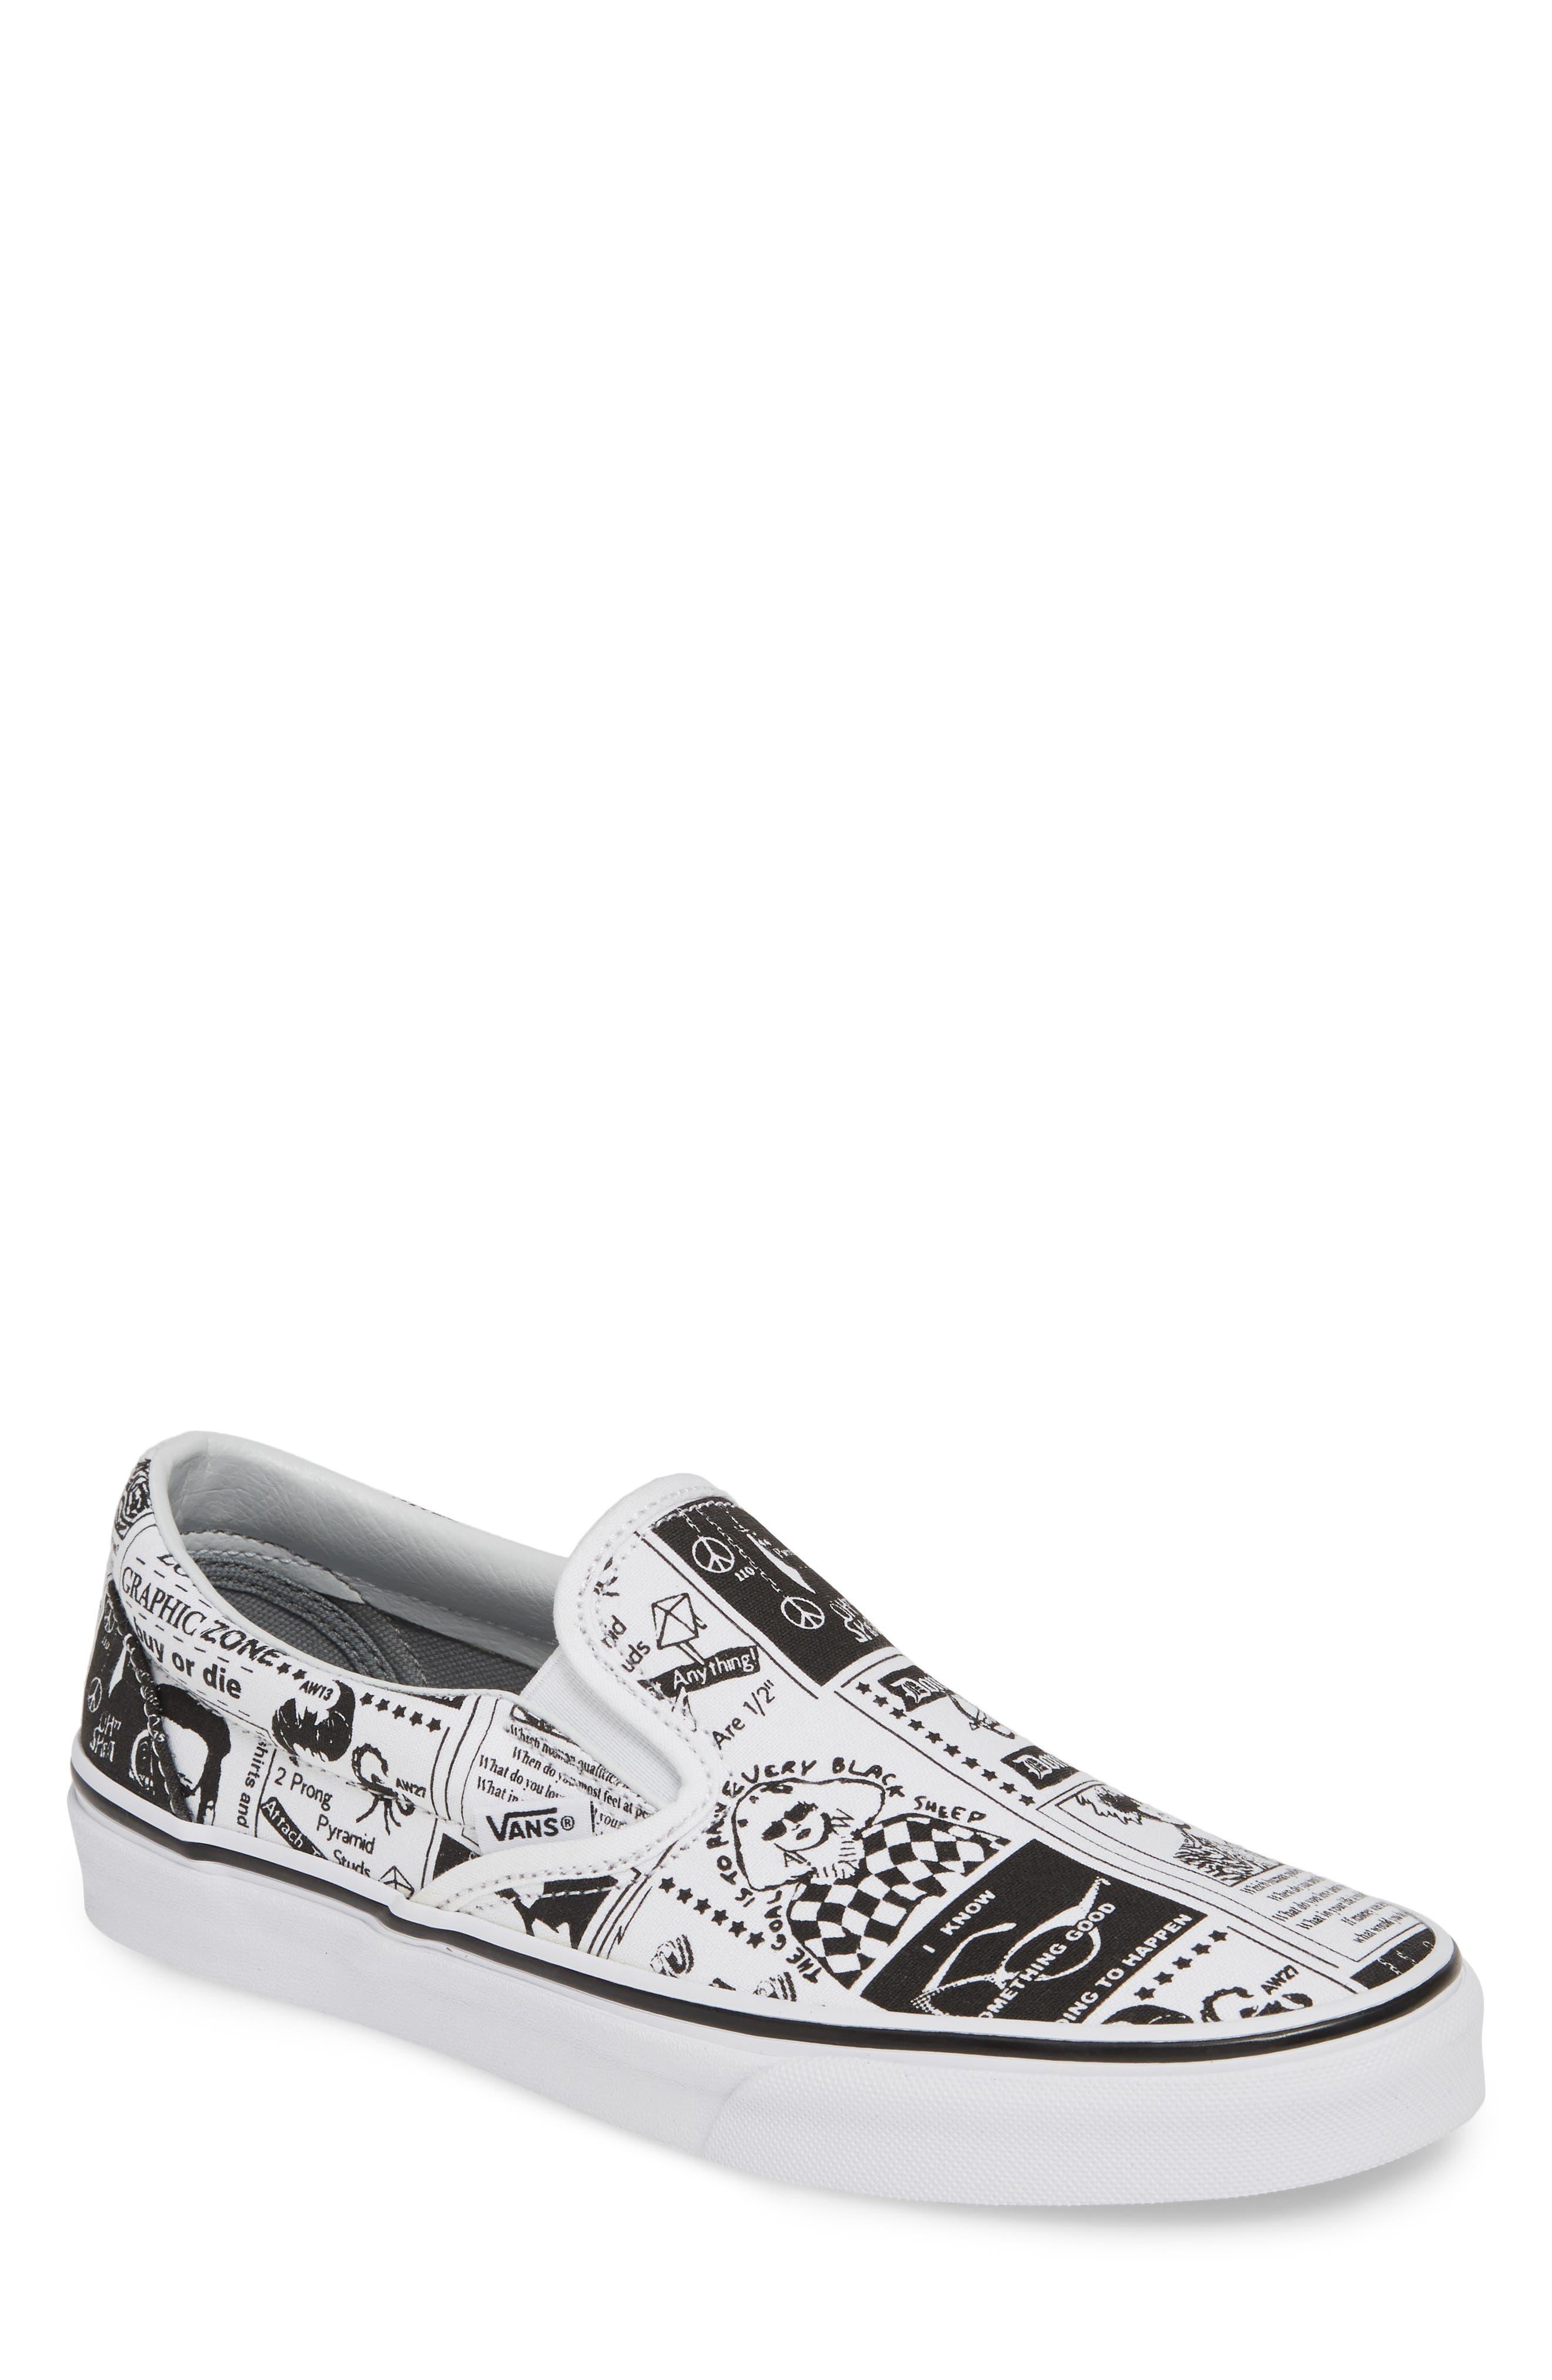 VANS,                             x Ashley Williams Print Classic Slip-On Sneaker,                             Main thumbnail 1, color,                             100